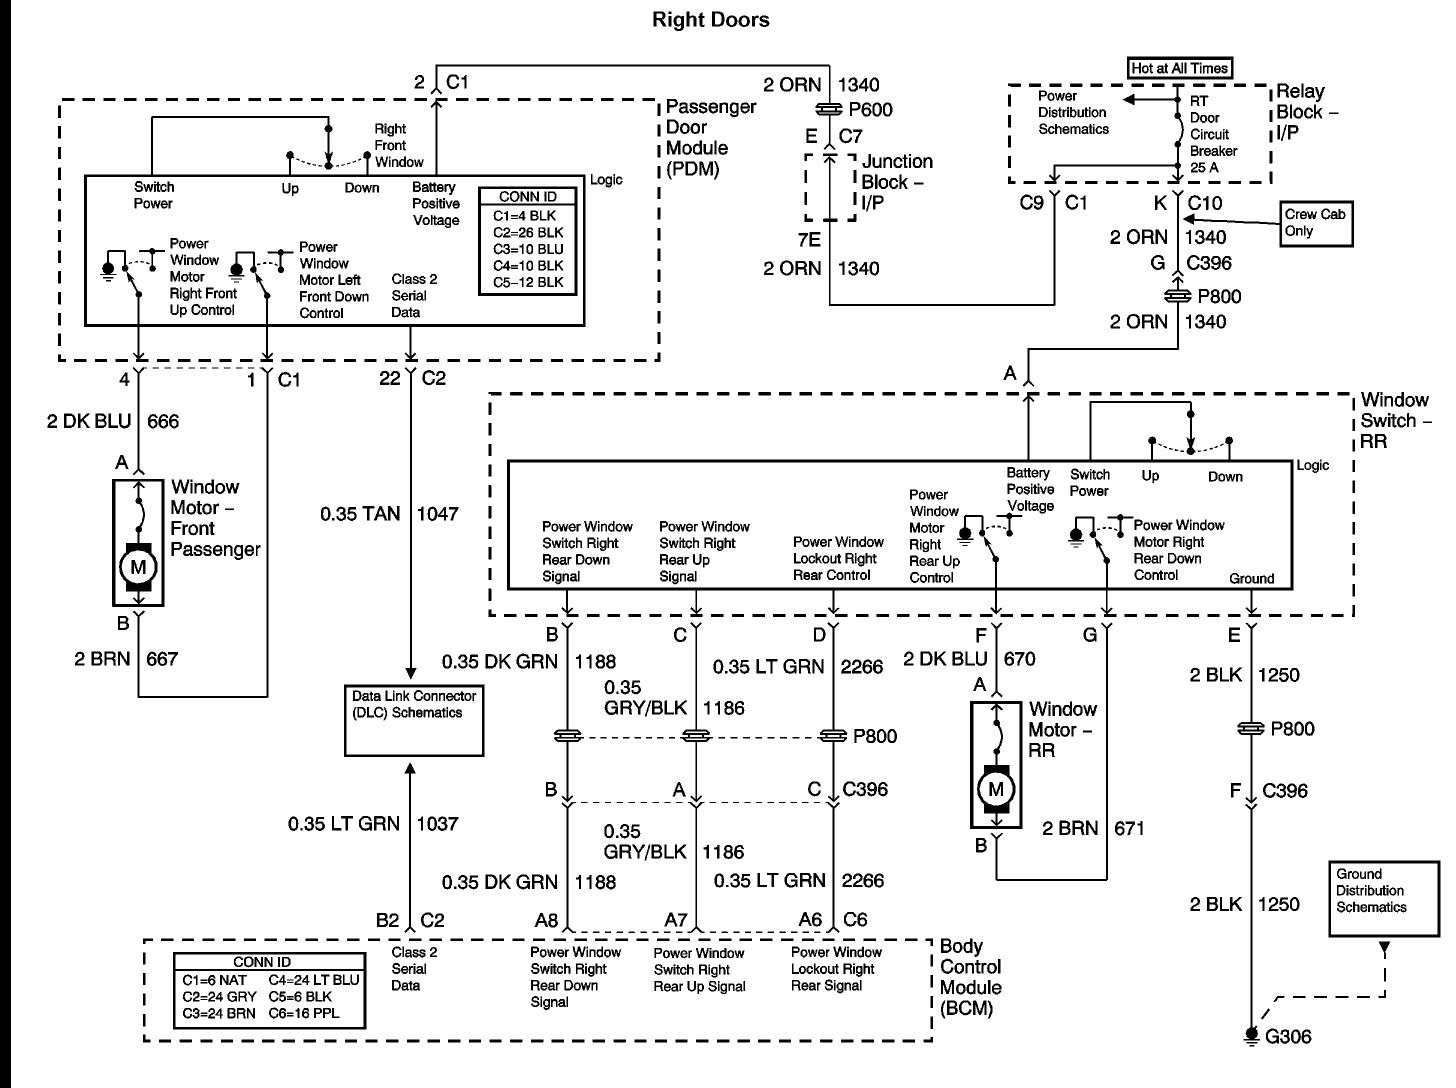 2004 Chevy Silverado Passenger Power Windows: I Have a ...